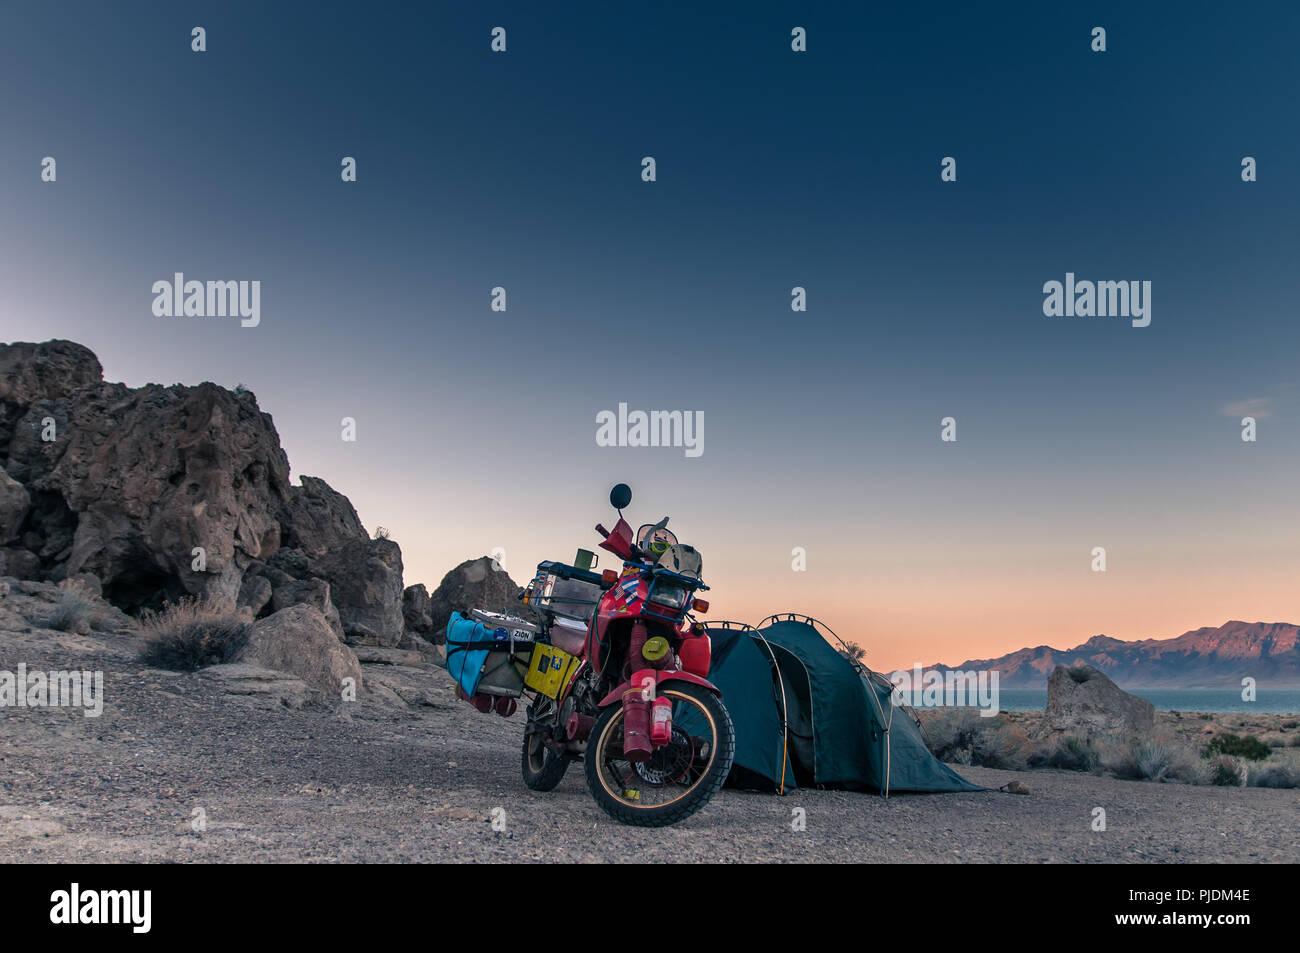 Touring bike parked by tent, Pyramid Lake, Nevada, USA - Stock Image